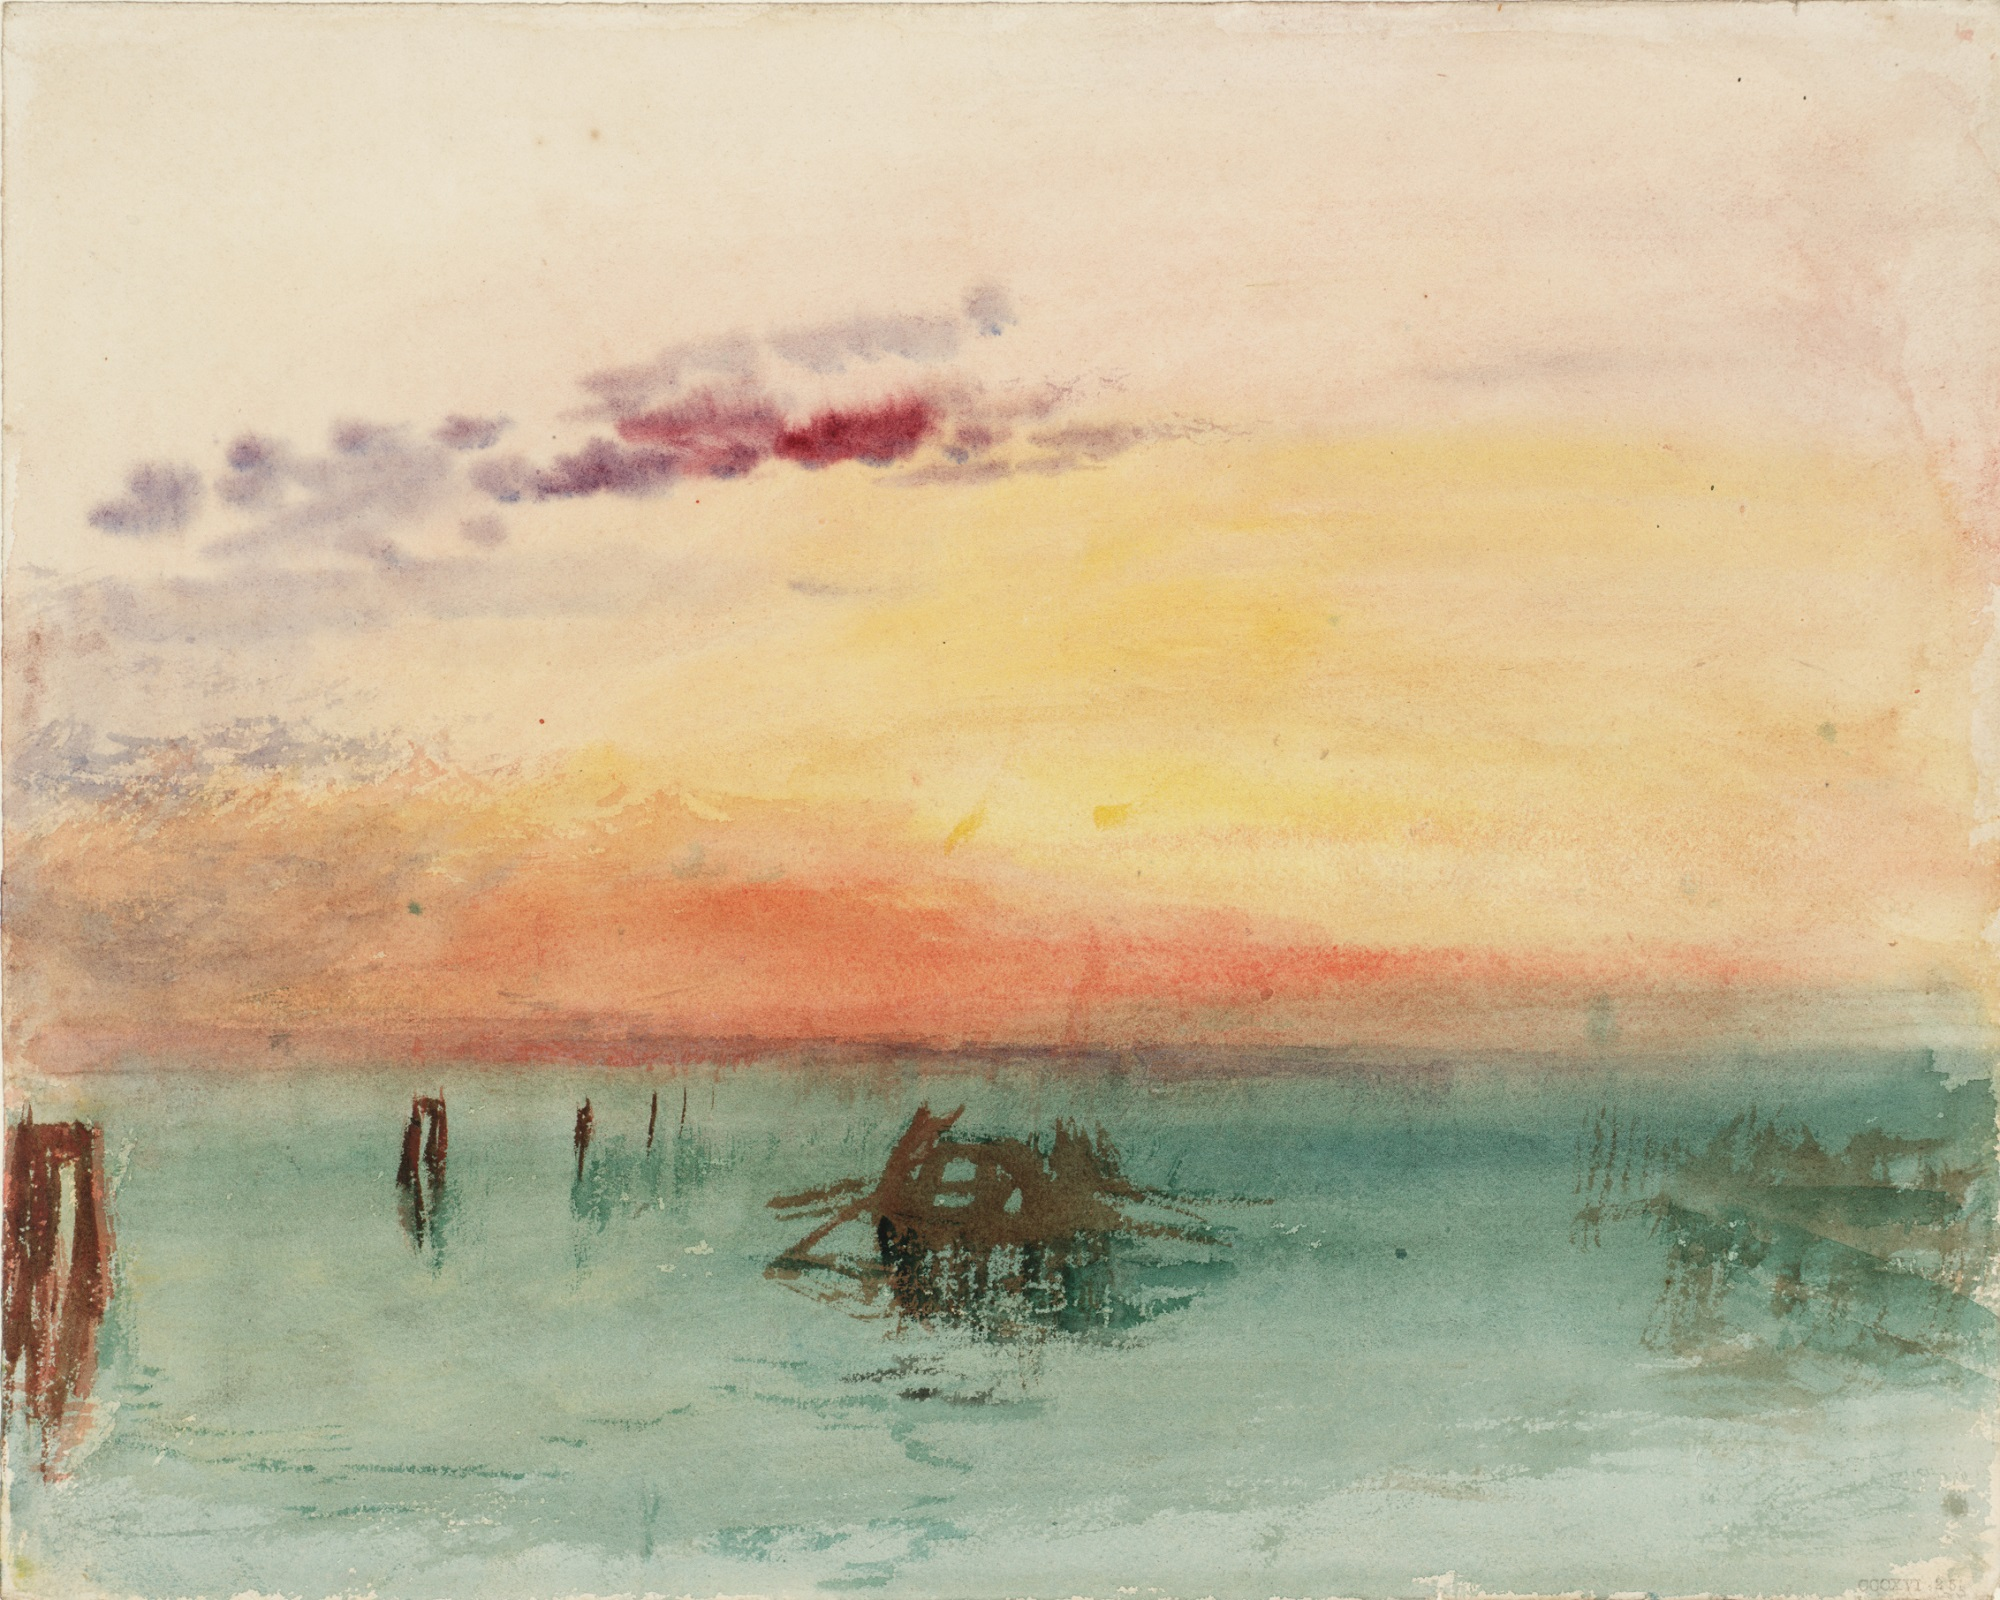 Paesaggio lagunare dipinto da Turner